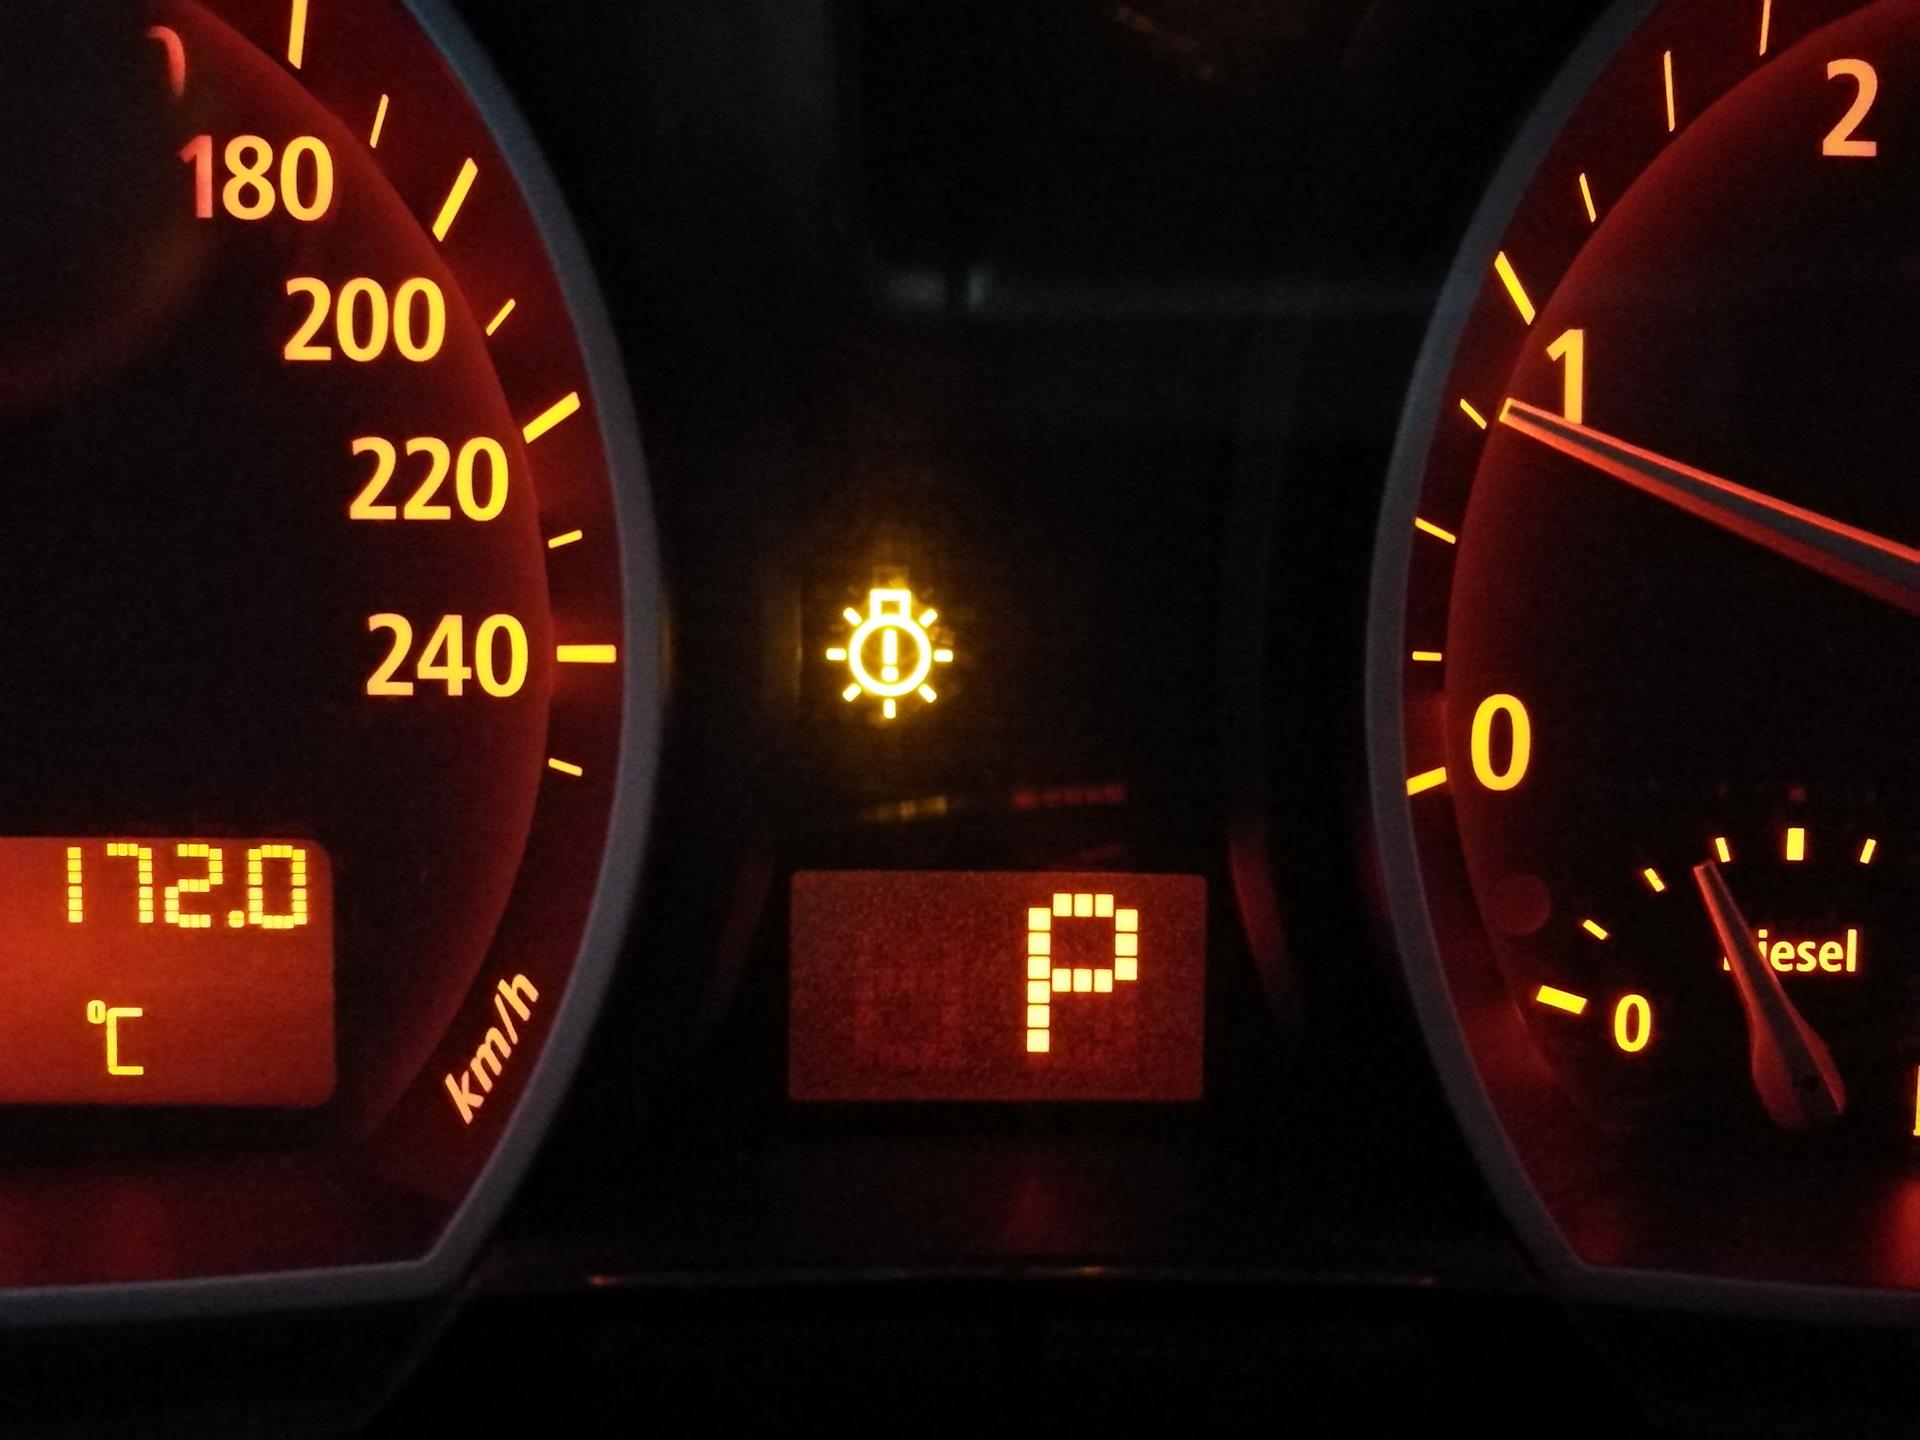 bmw x3 горит лампочка неисправности коробки передач